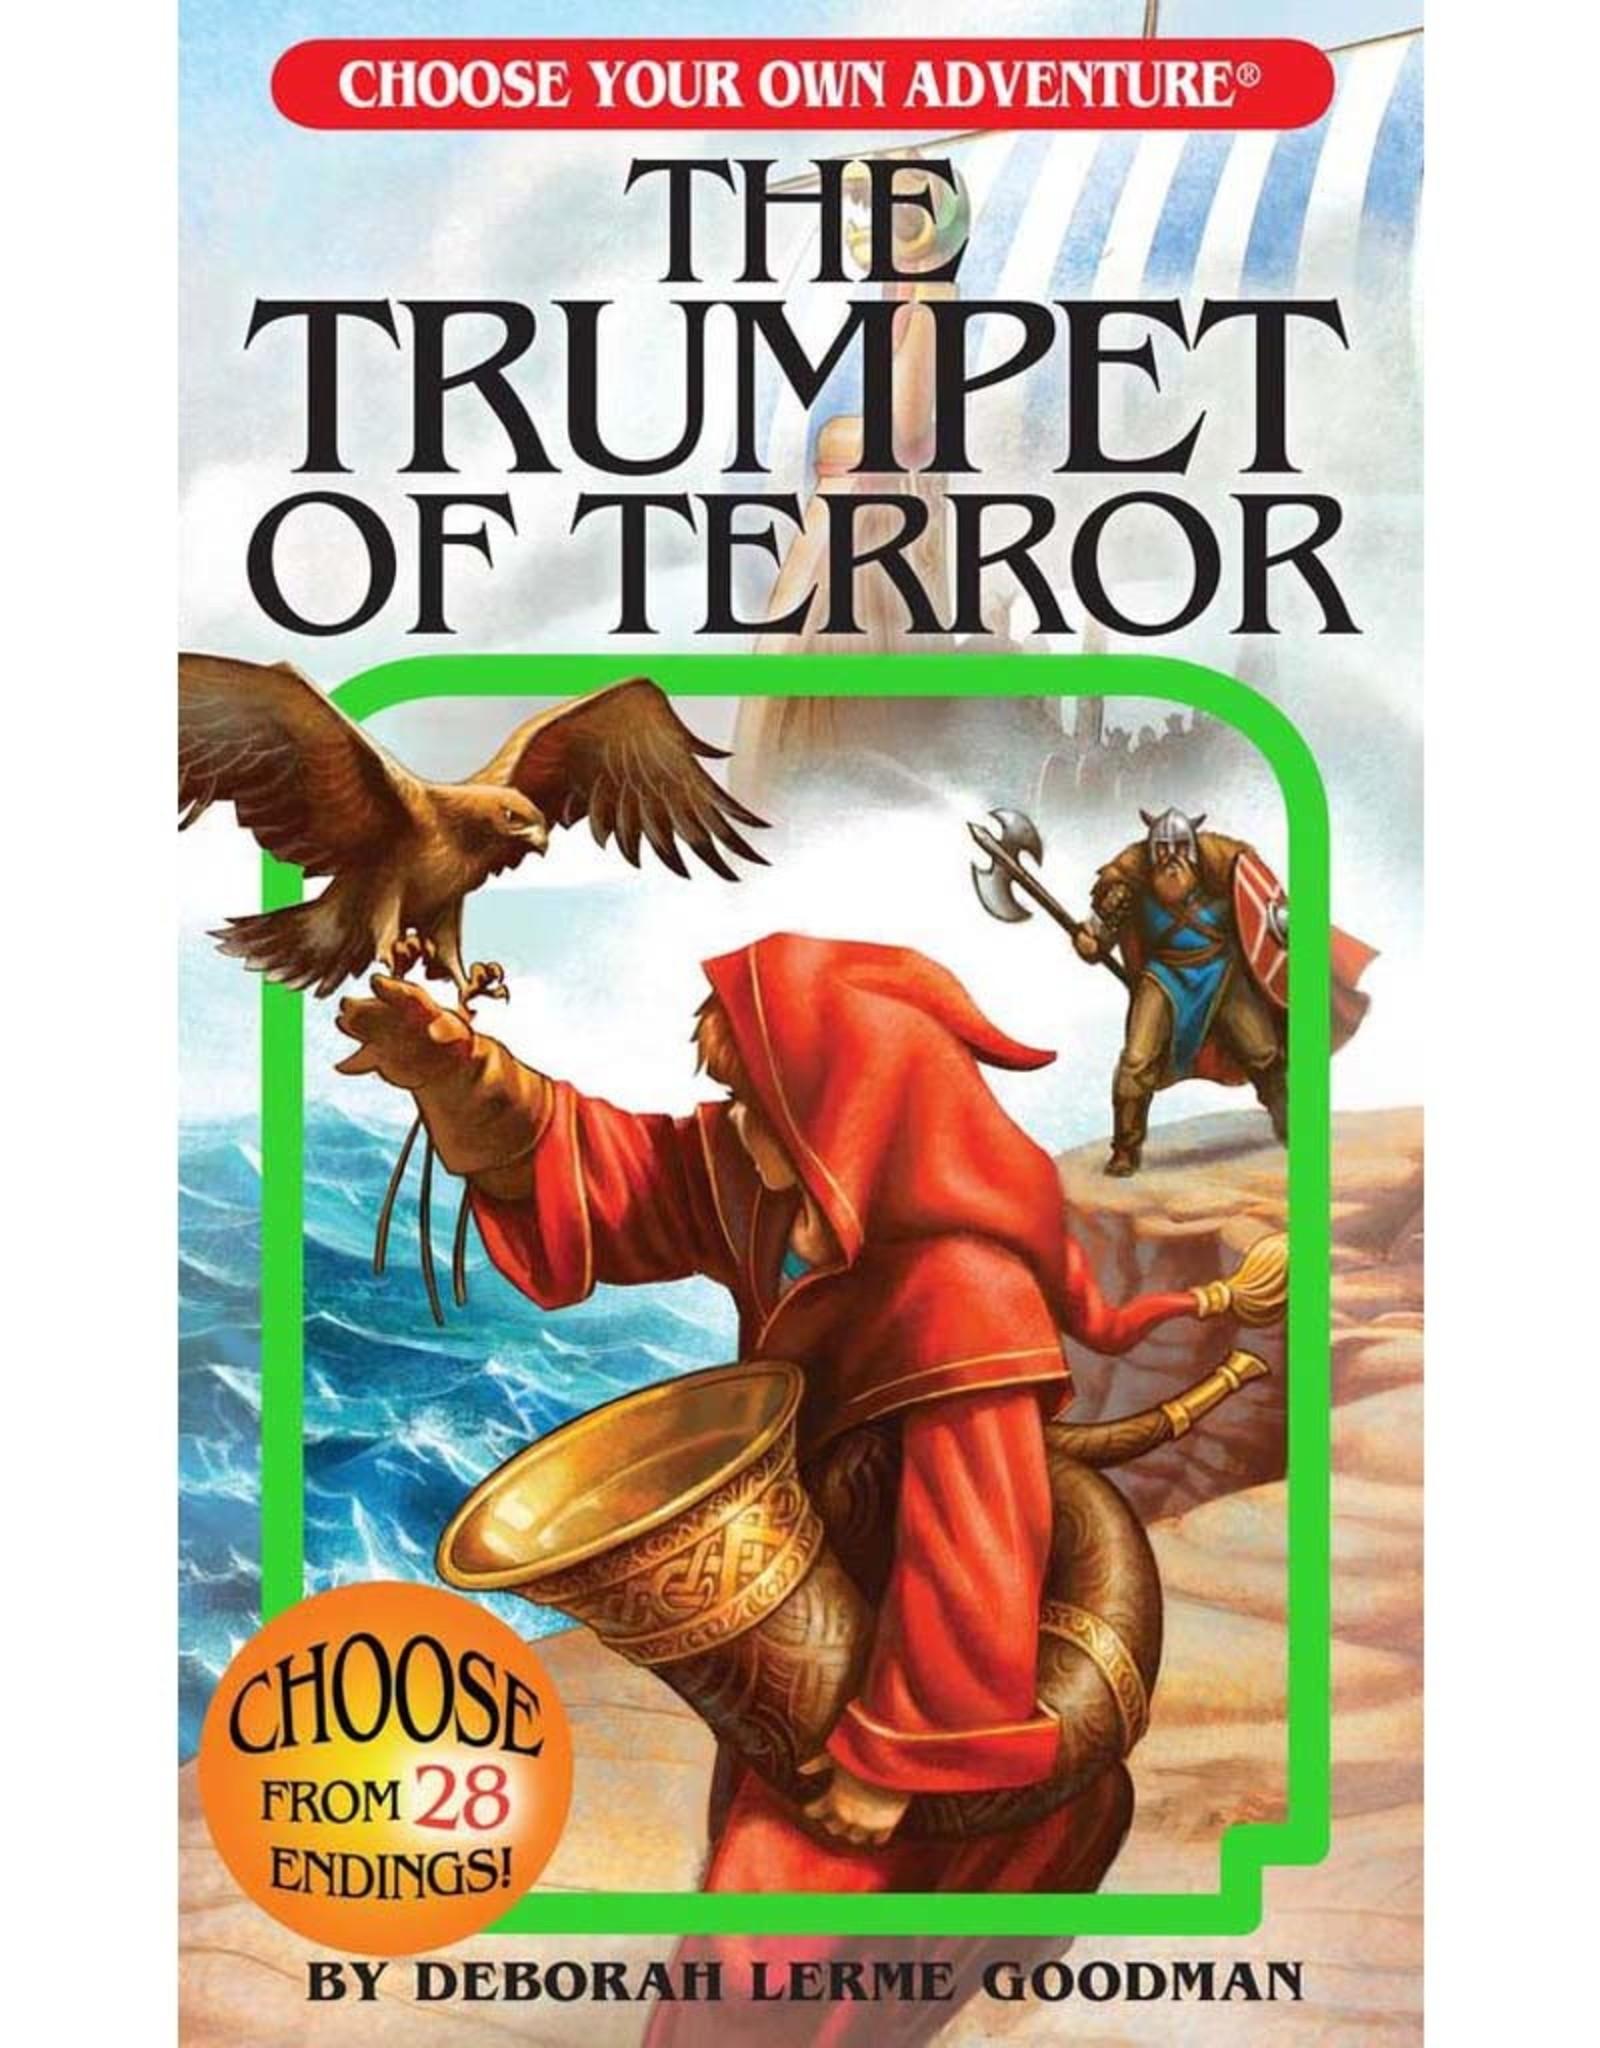 ChooseCo CYOA#189 The Trumpet of Terror